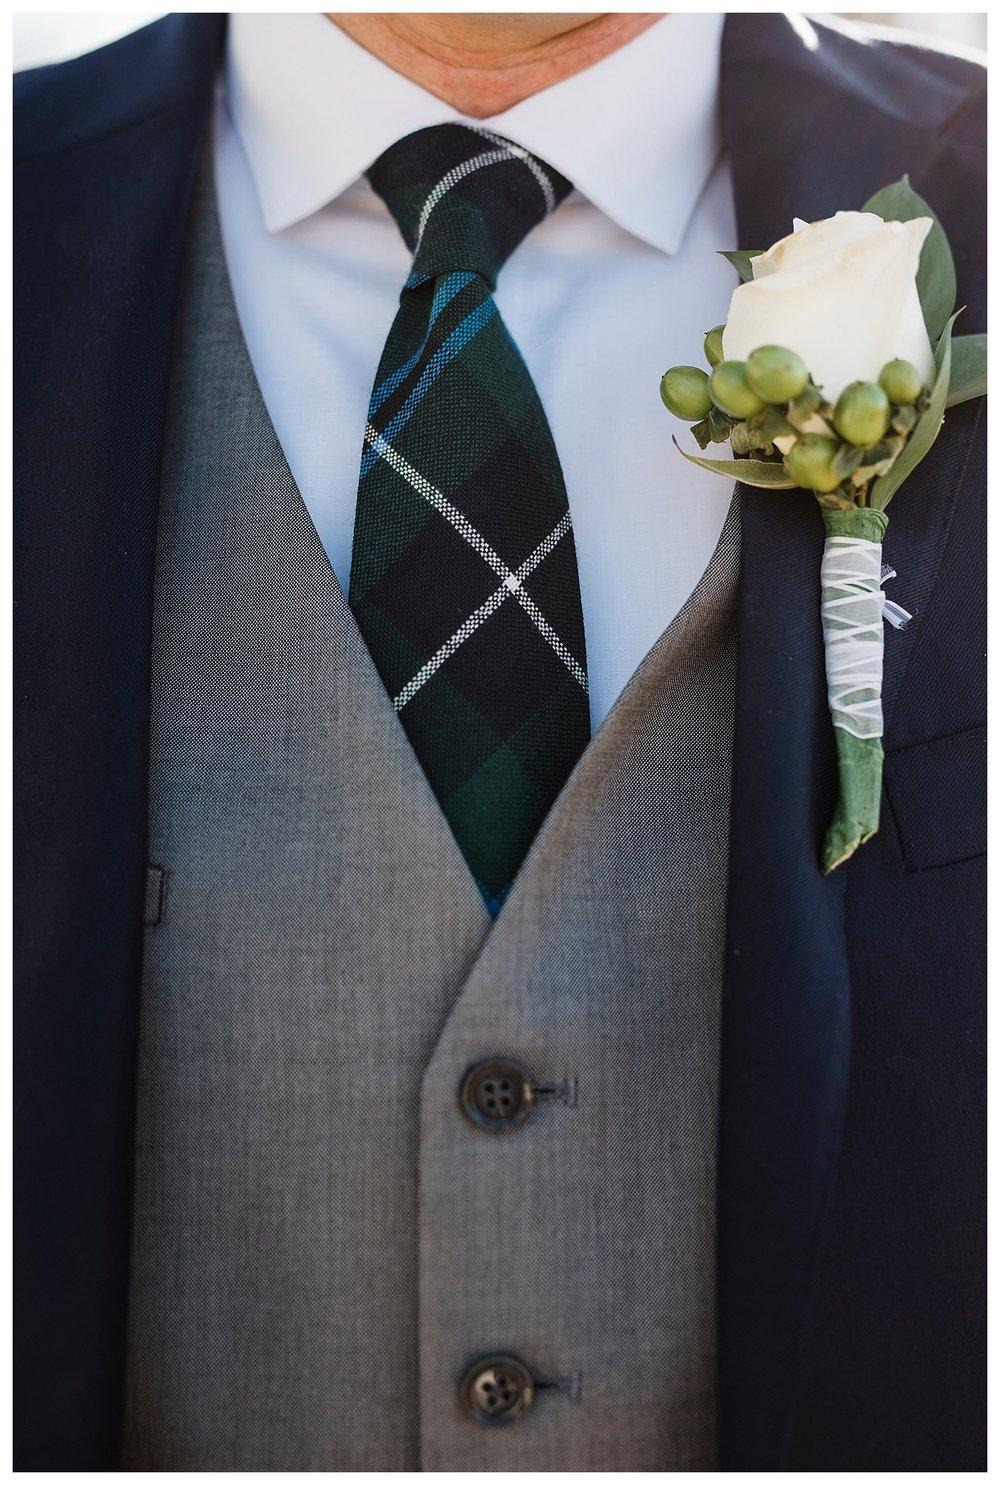 Tartan_Tie_The_Barn_At_Raccoon_Creek_Wedding_Apollo_Fields_018.jpg